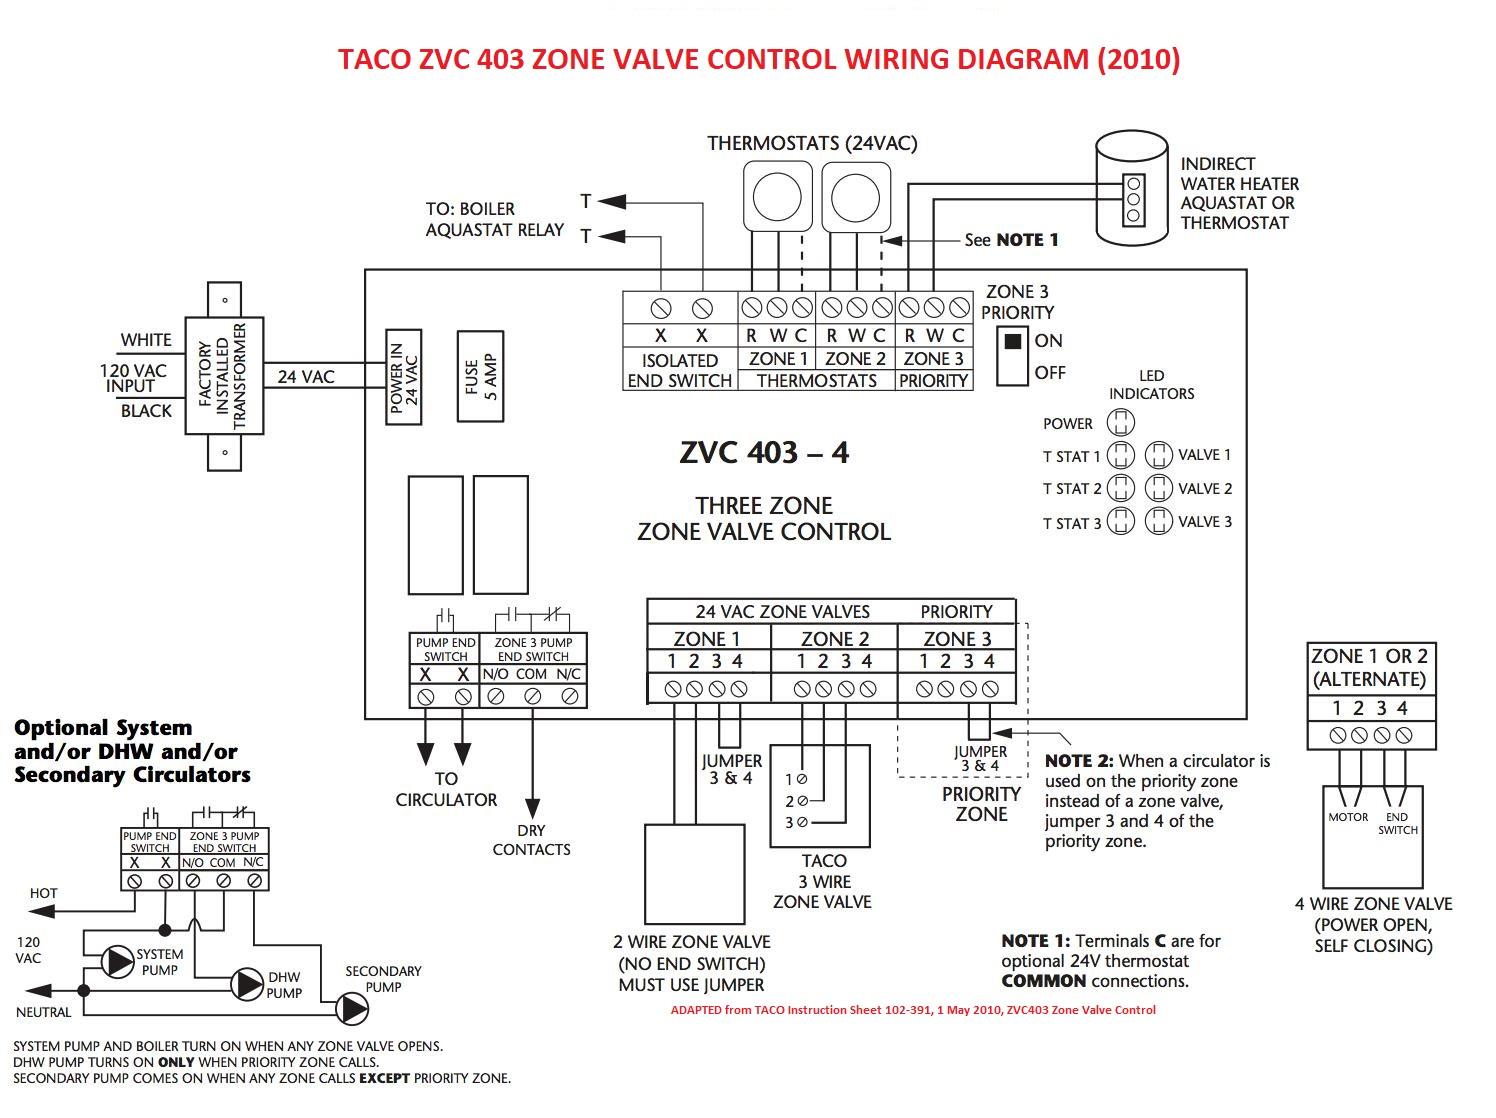 CAC Wiring Diagram 4 Schematic Box   Wiring ResourcesWiring Resources